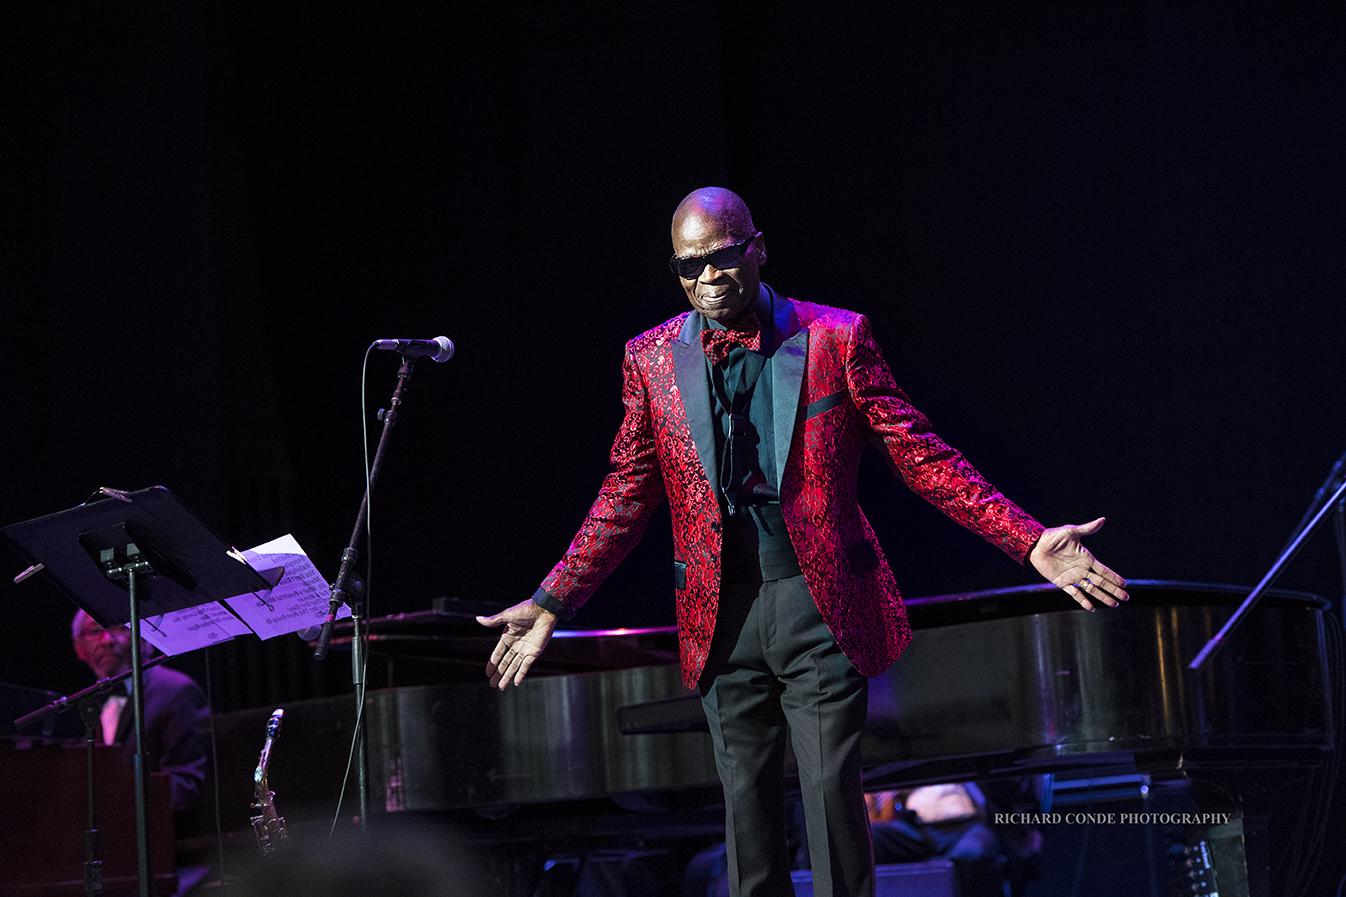 Maseo Parker at the Freihofer Saratoga Jazz Festival 2017